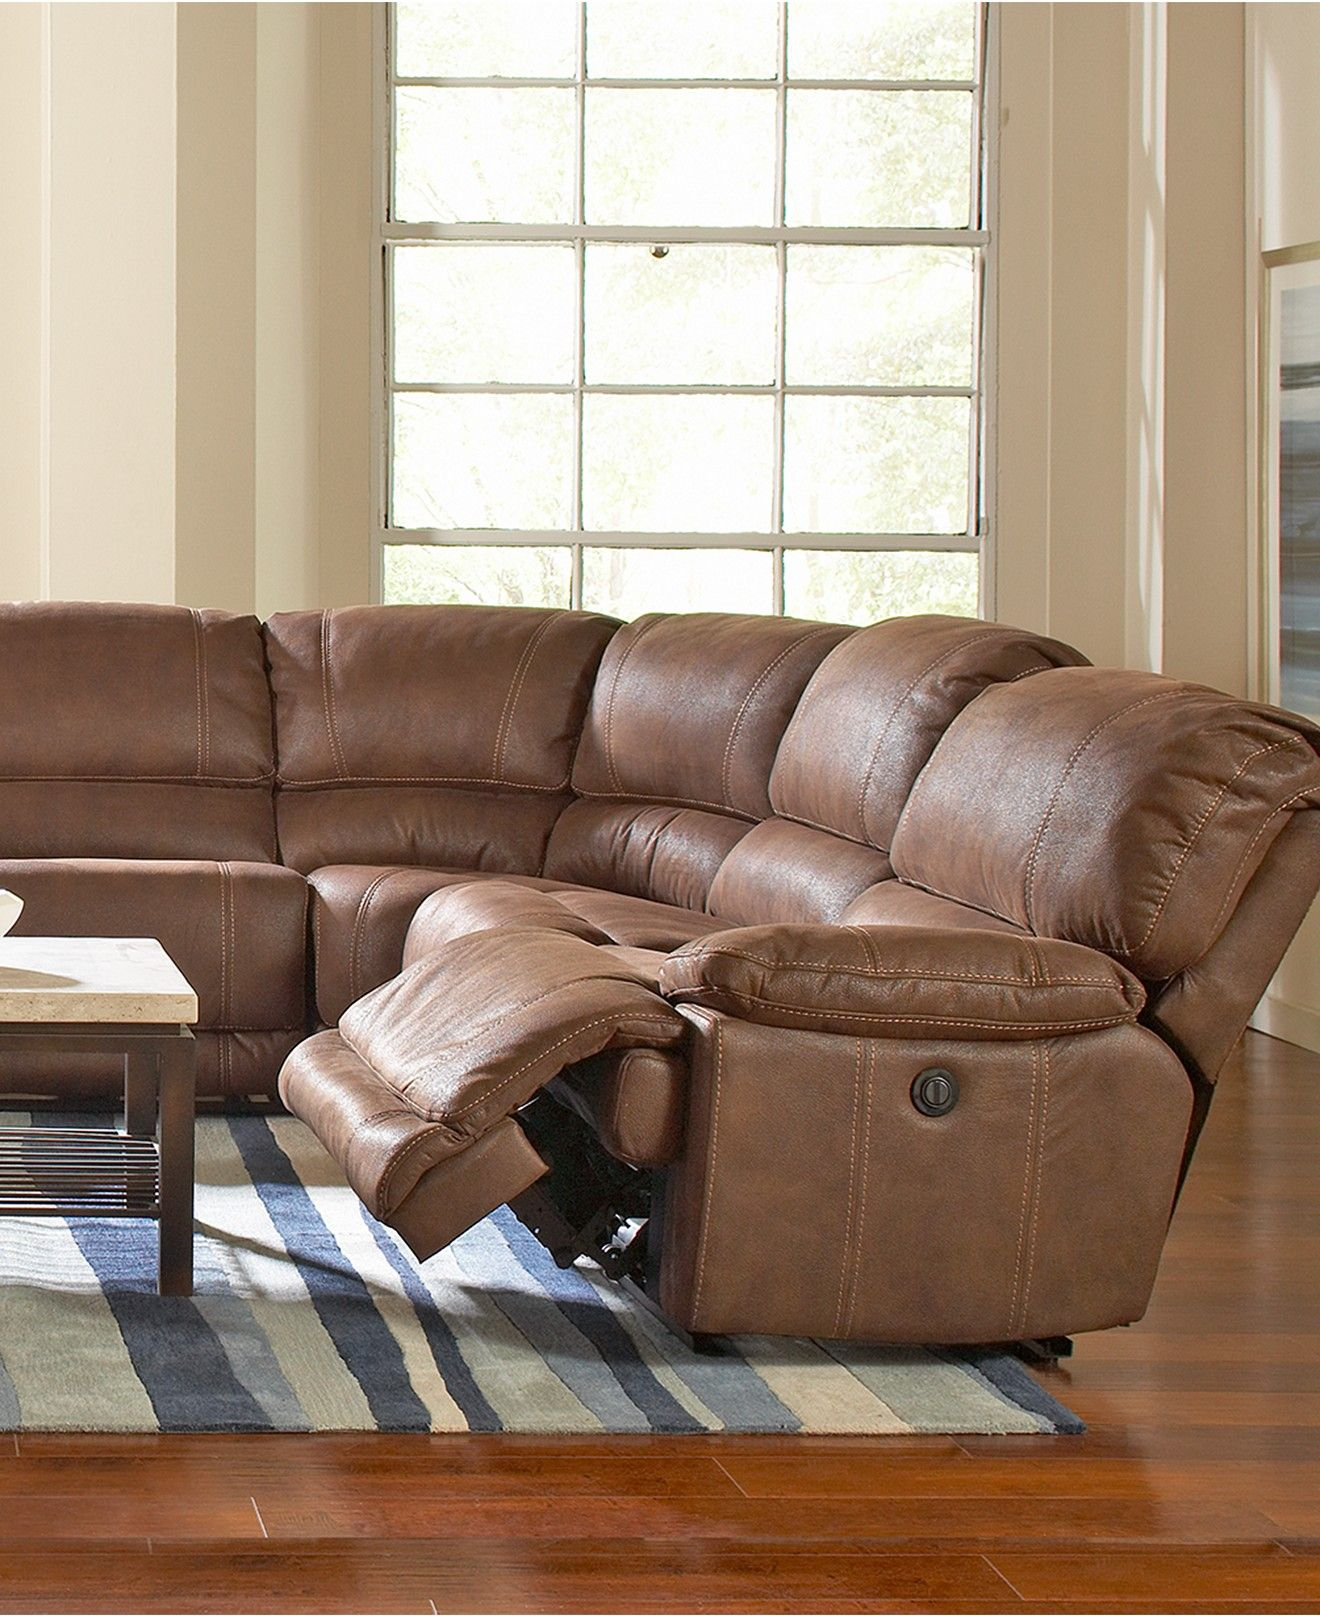 Sectional Sofa Corner Wedge Scs Sofas Jedd Fabric 6 Piece Power Reclining 2